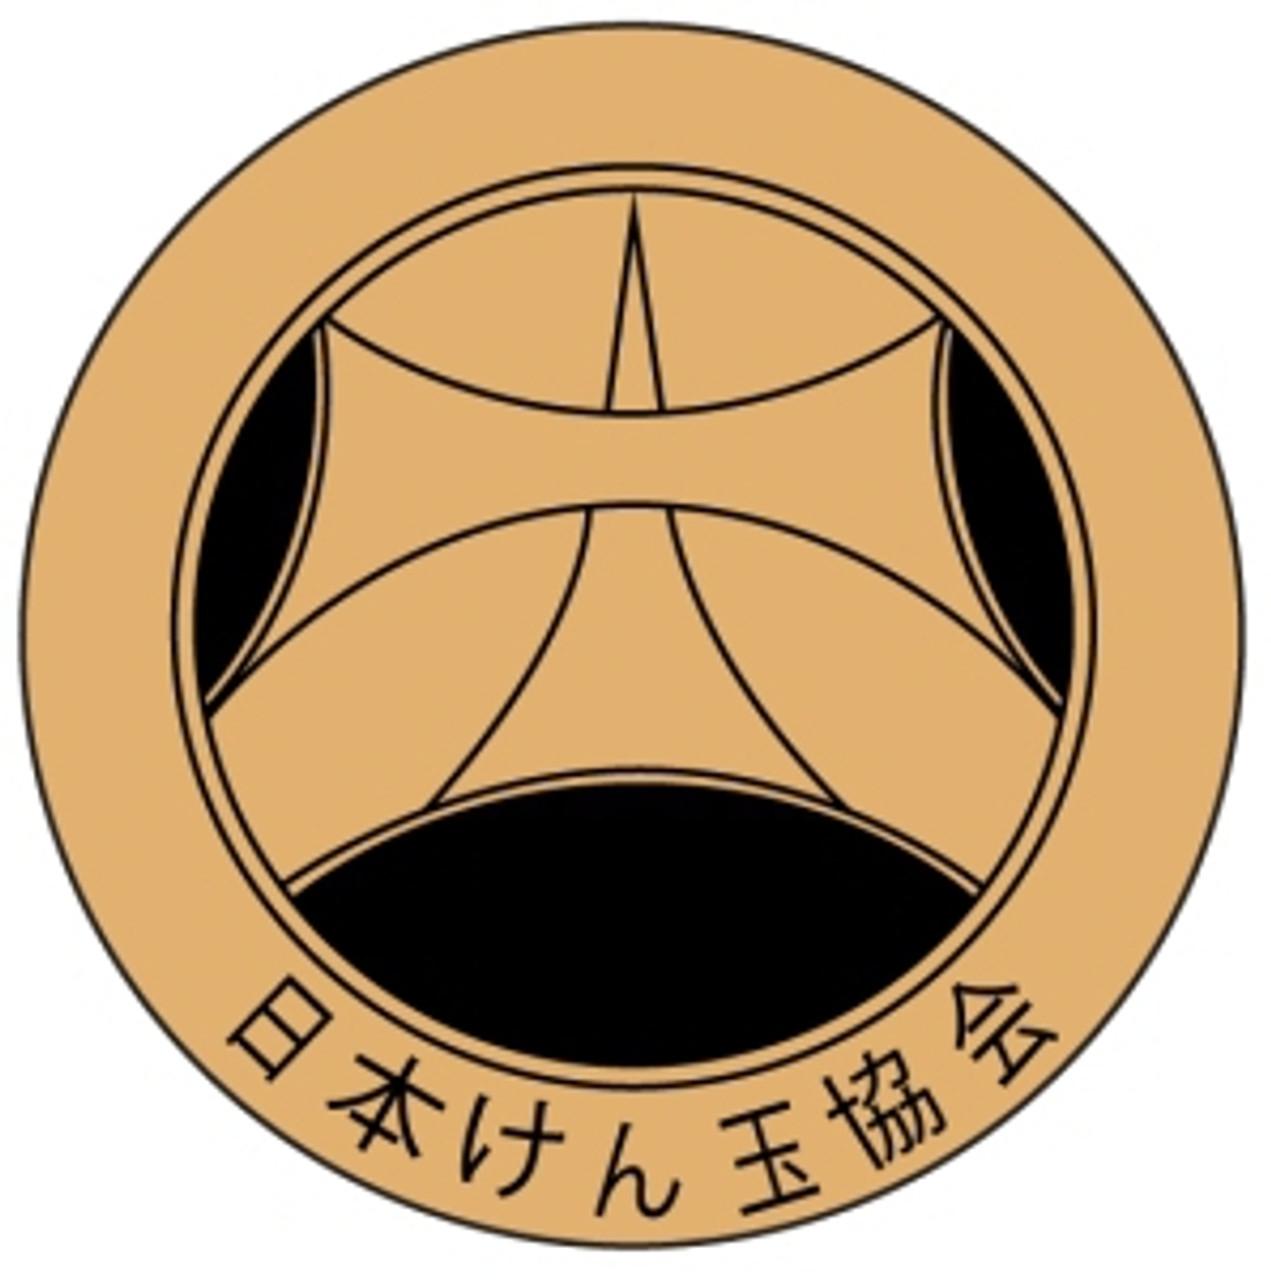 Shin Fuji Kendama